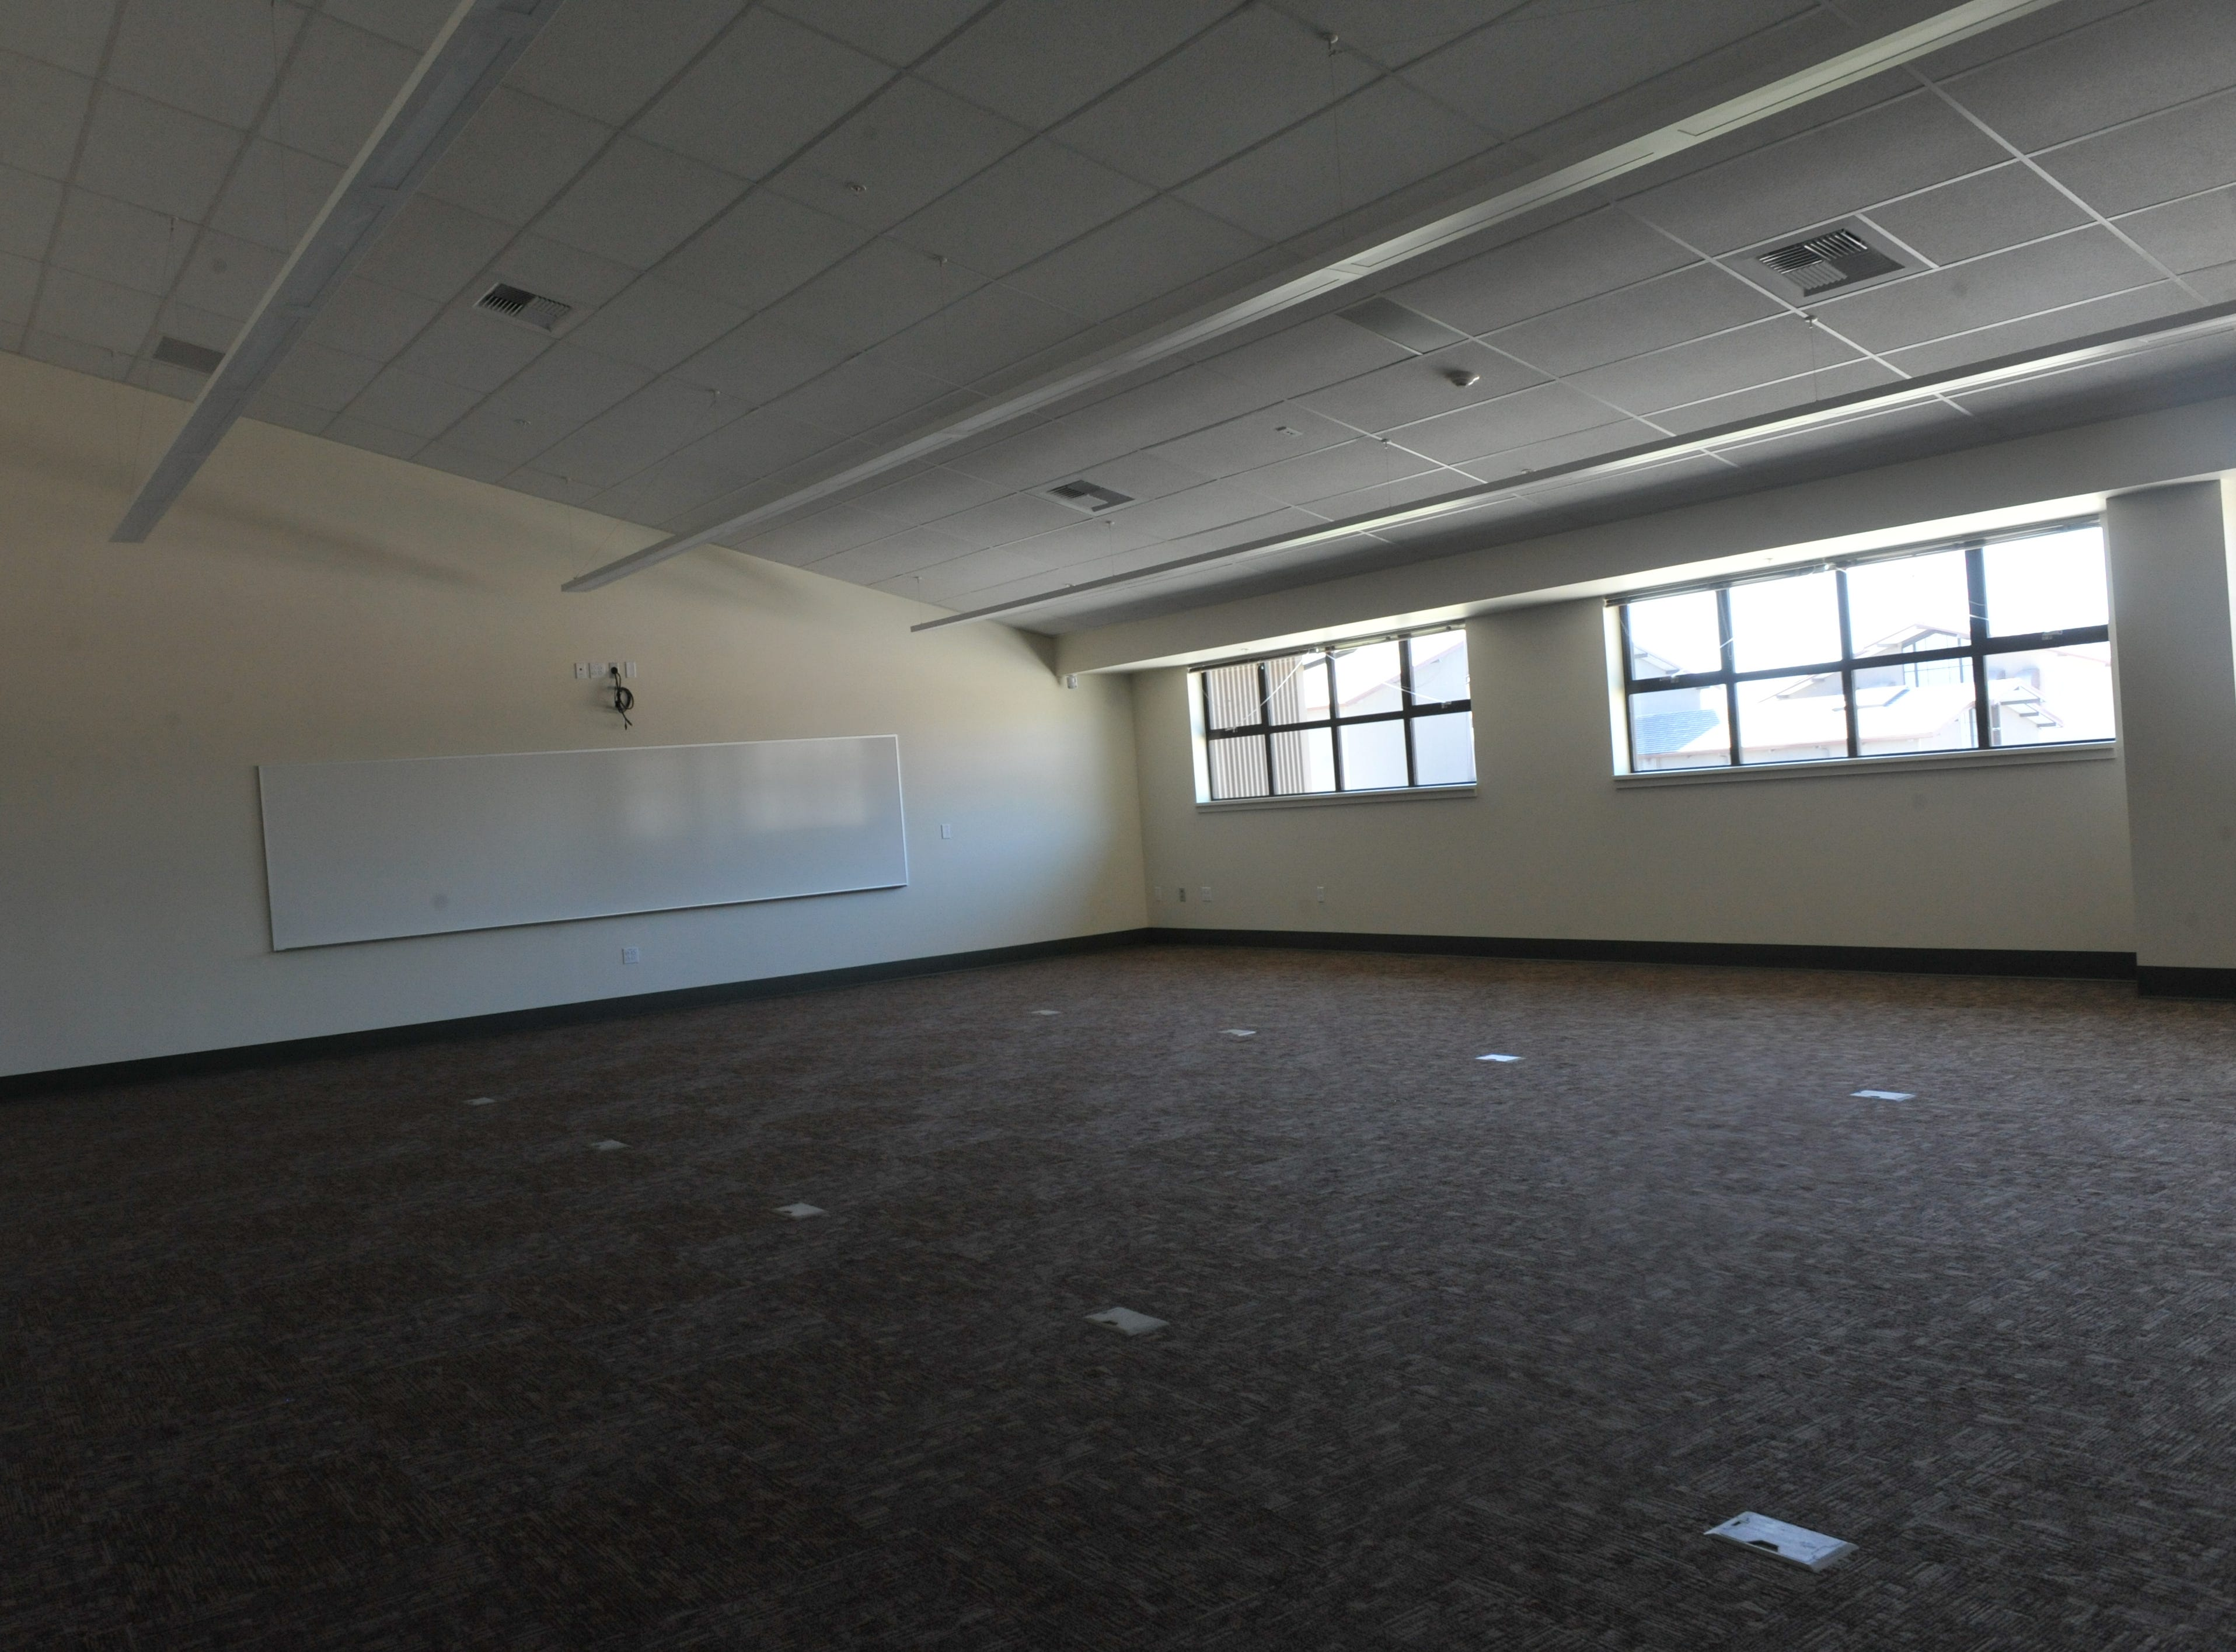 View of a classroom at Rancho San Juan High School.